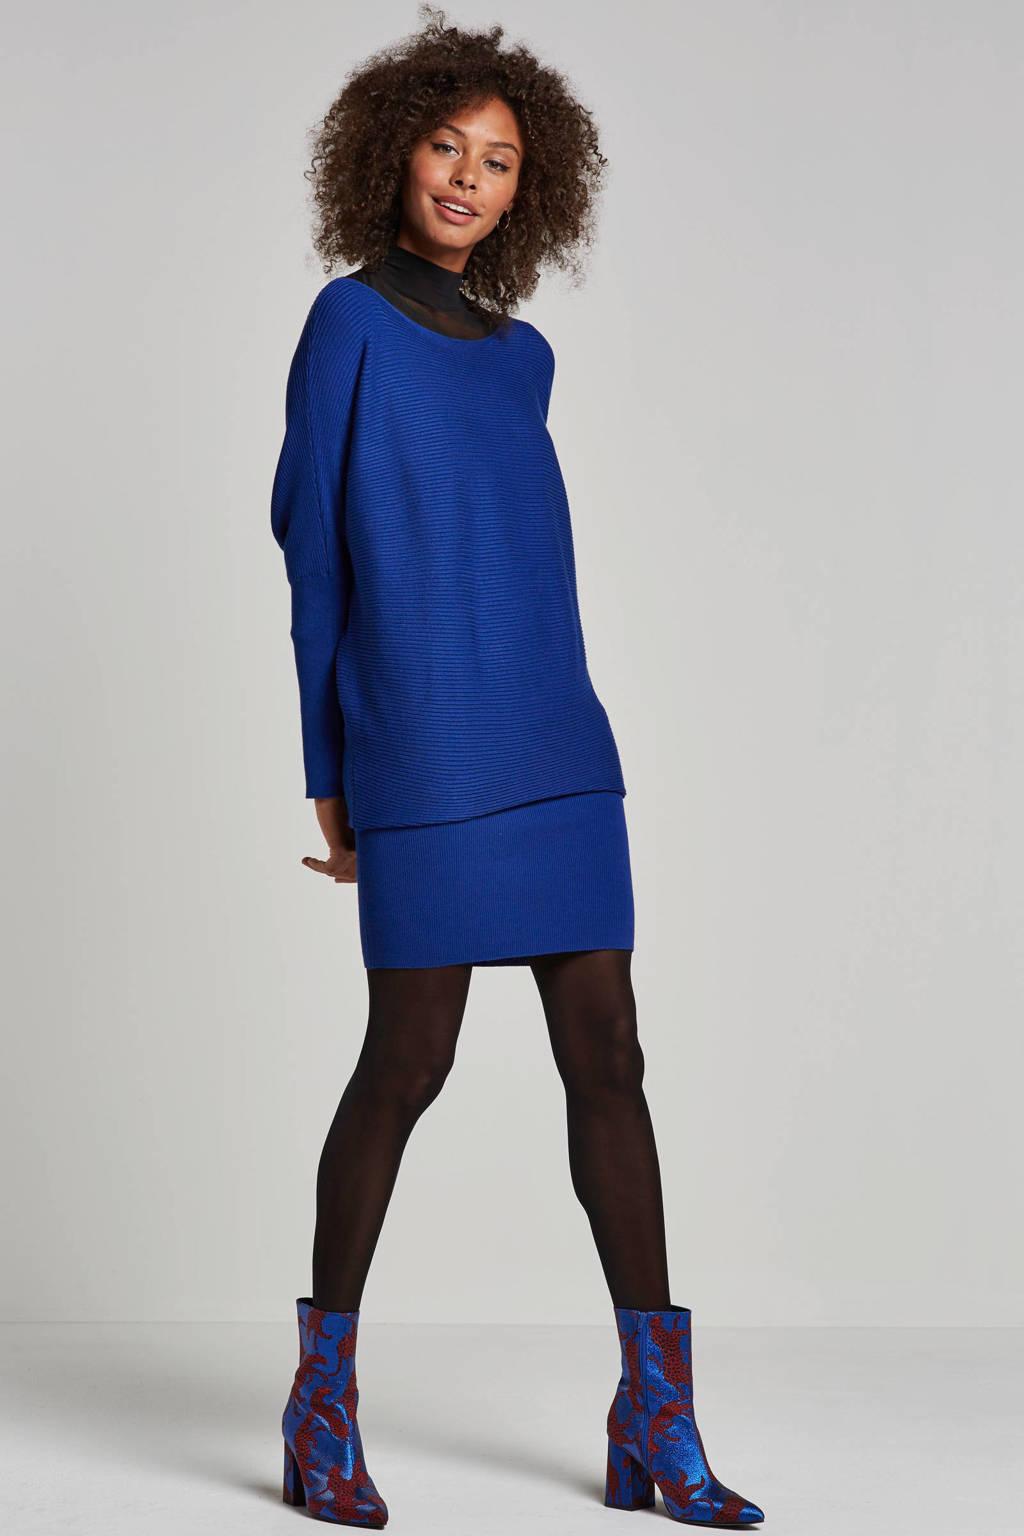 whkmp's own fijnbrei jurk met vleermuismouw, Kobaltblauw